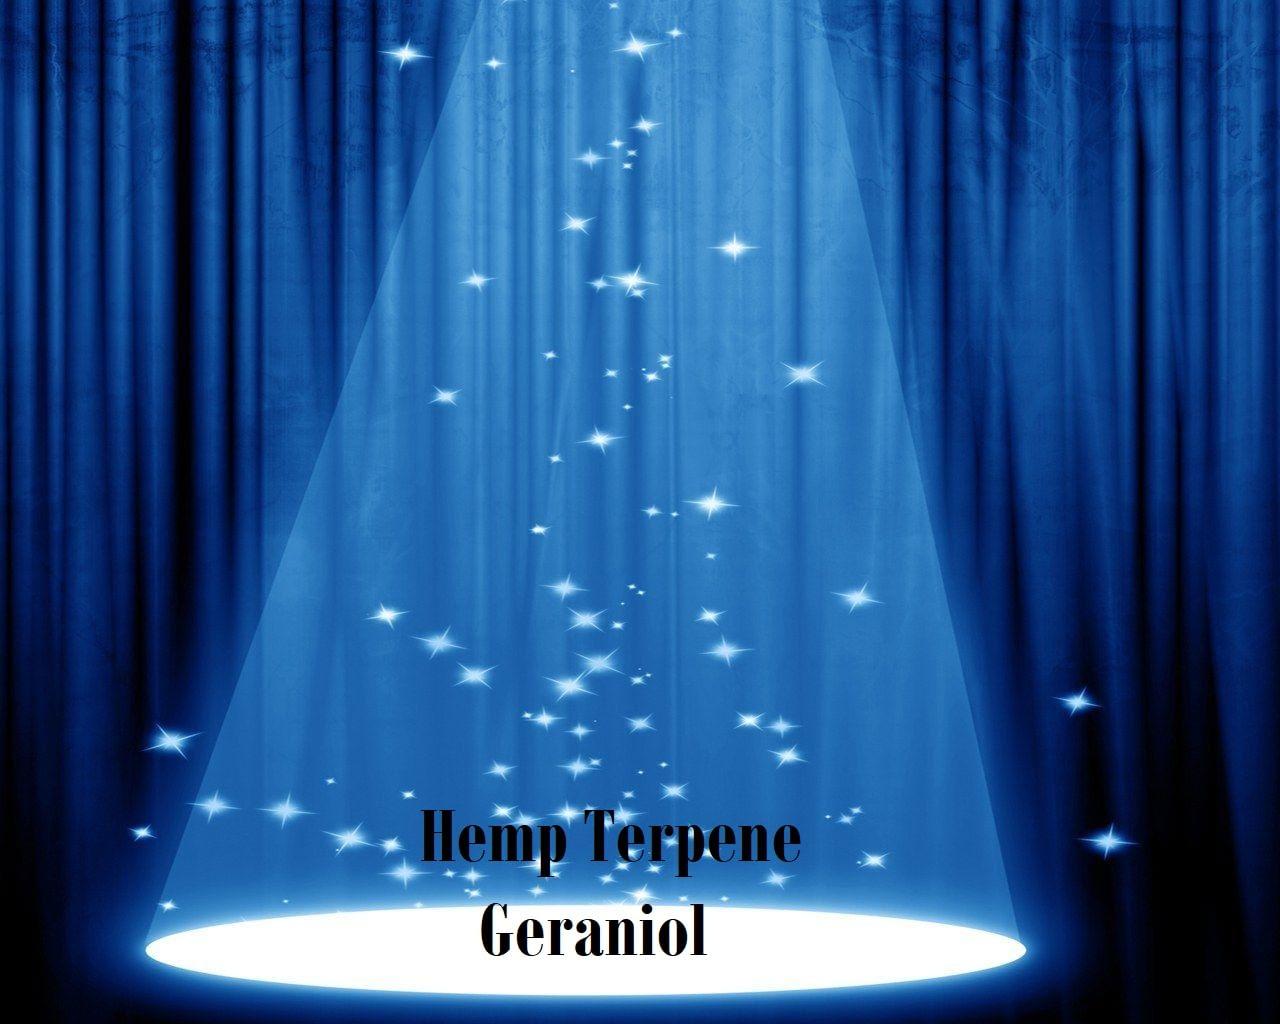 Hemp Terpene Geraniol